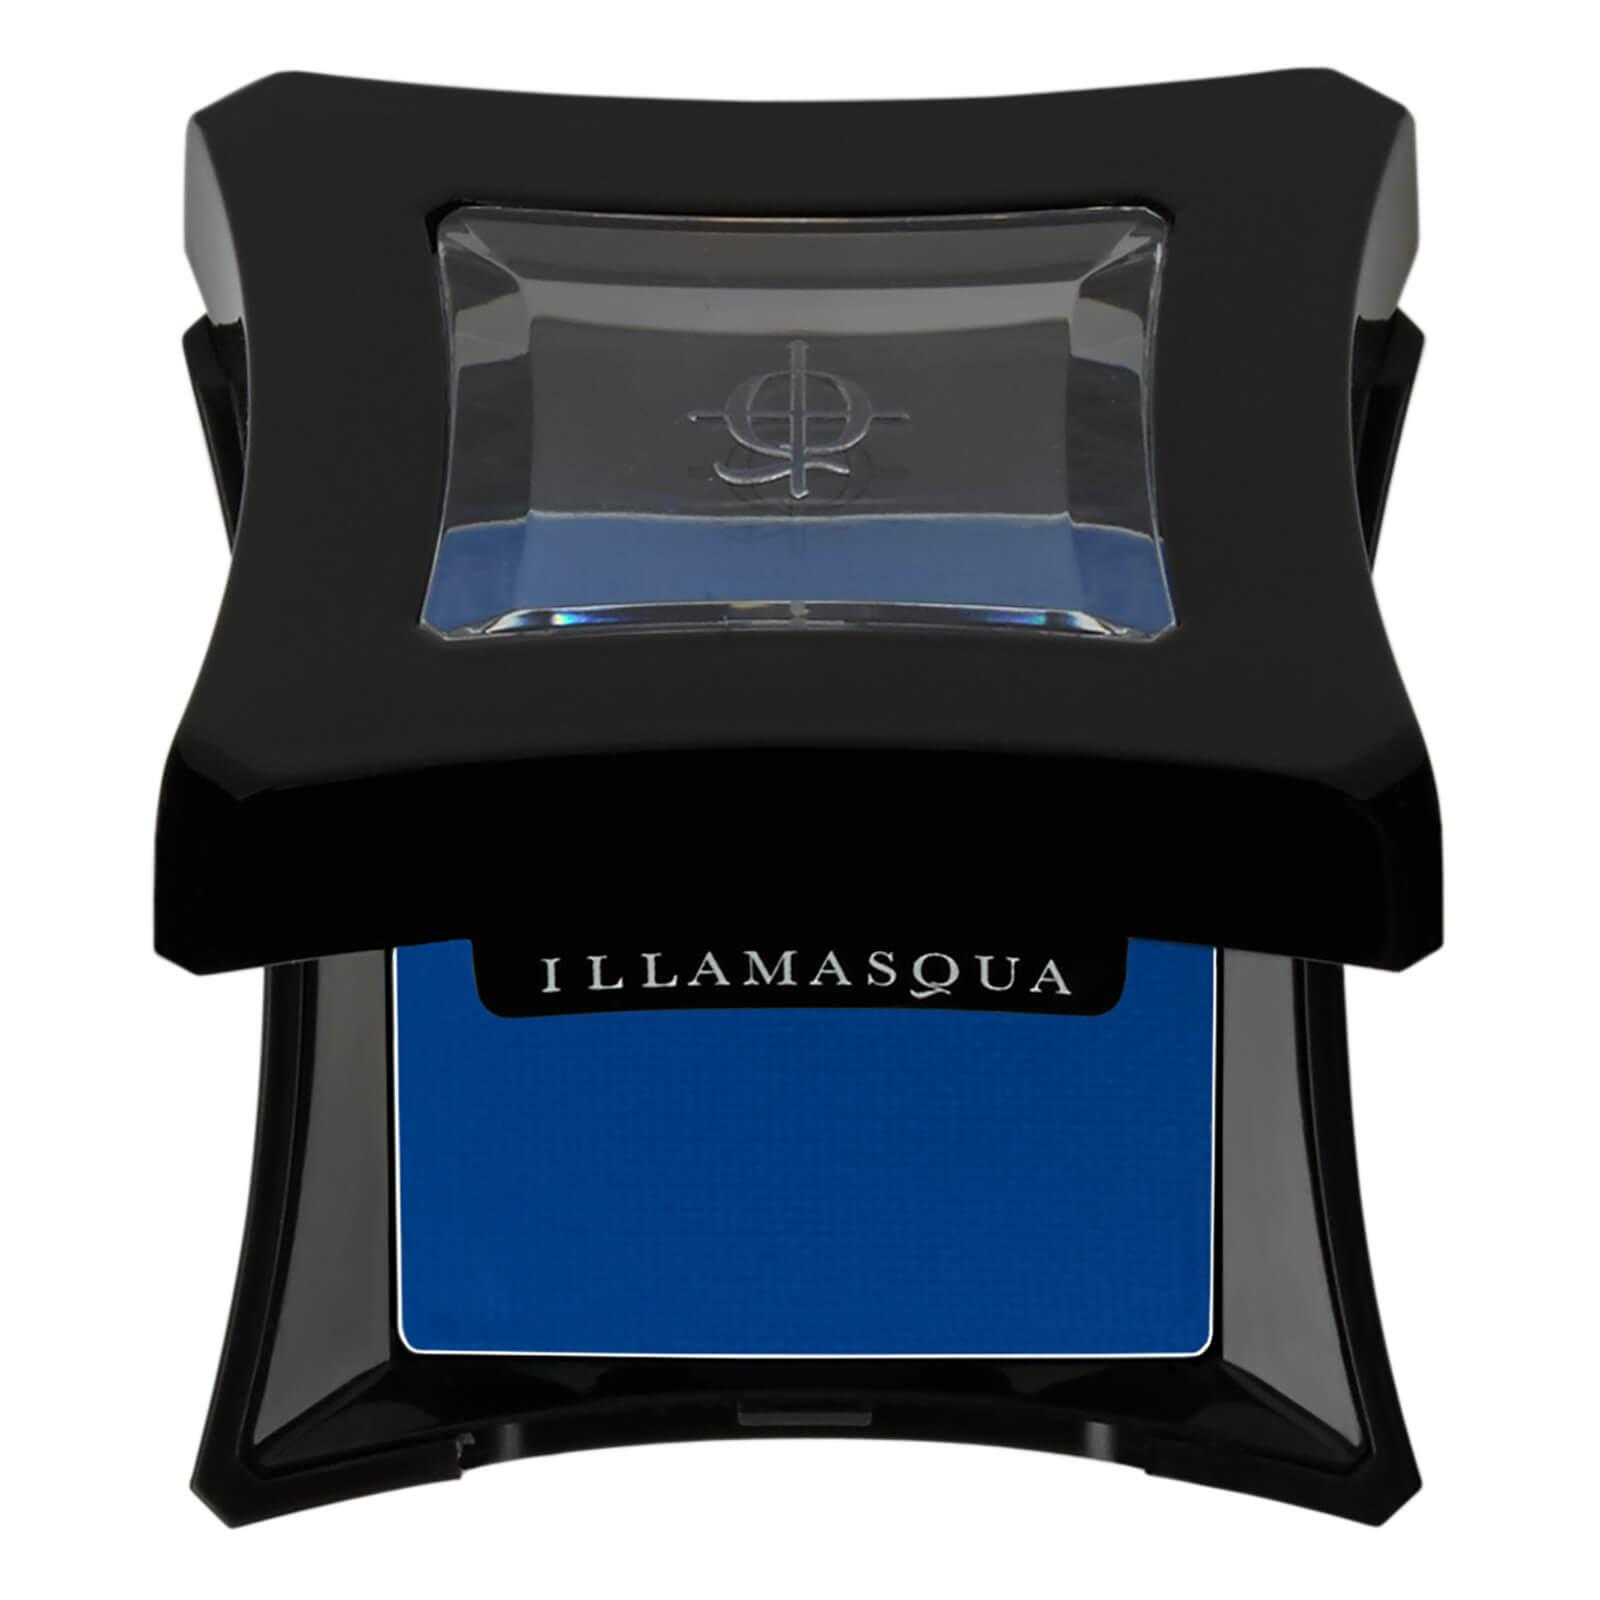 Illamasqua Powder Eye Shadow 2g (Various Shades) - Sadist